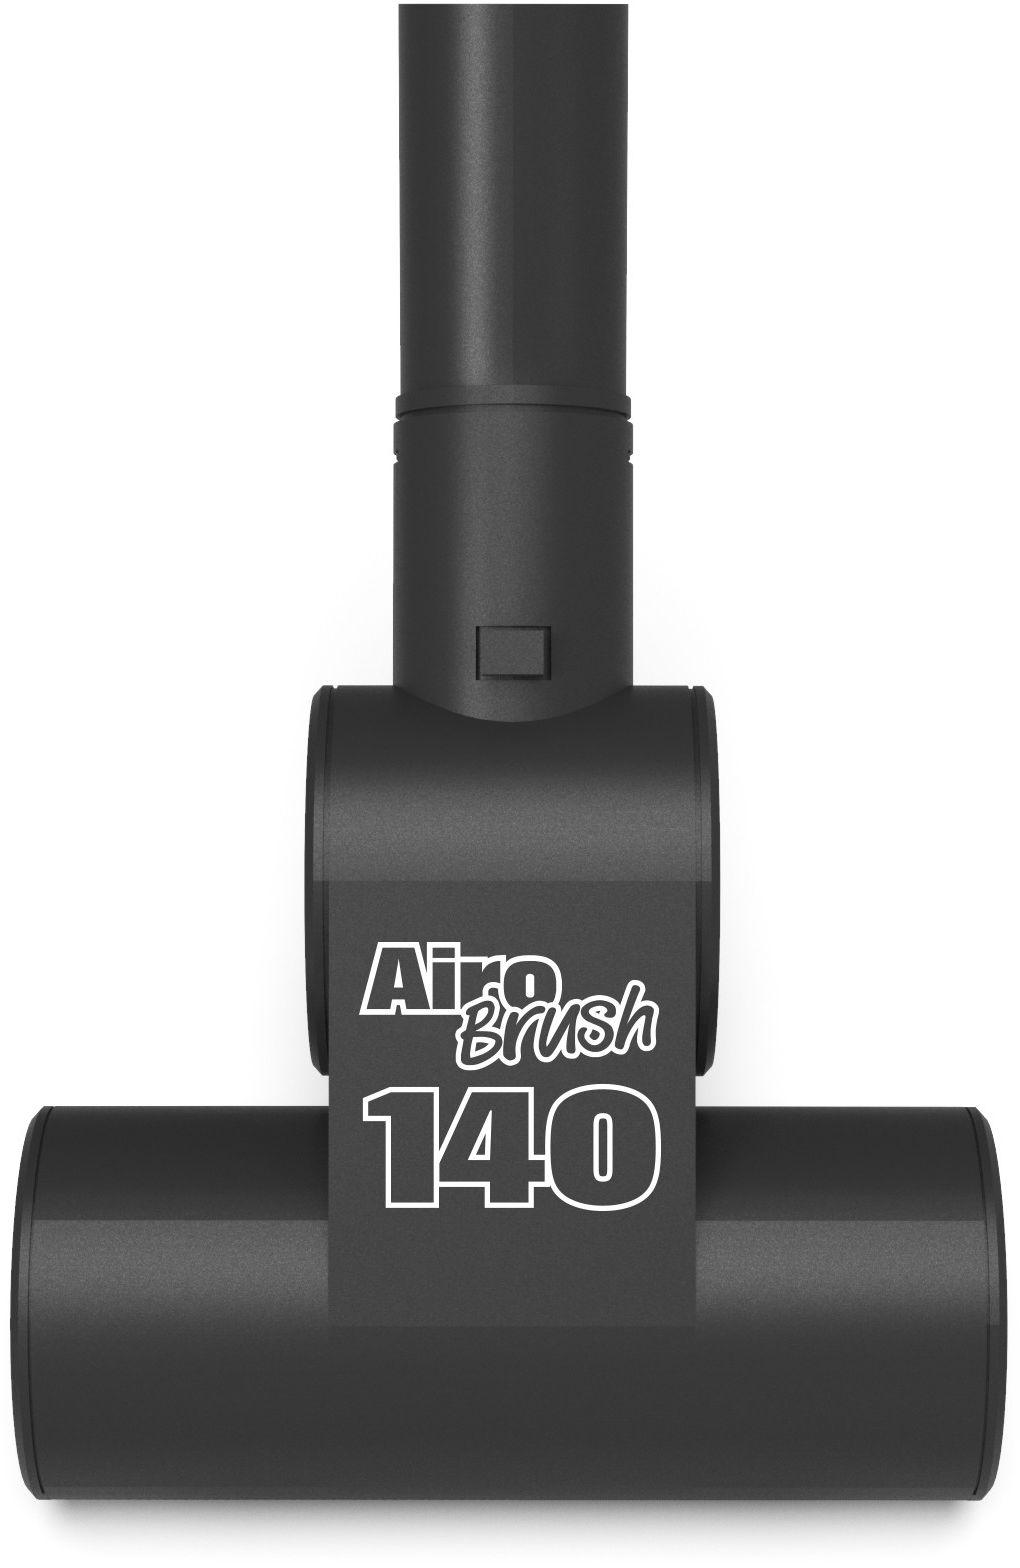 Turboszczotka Numatic AiroBrush 140mm do tapicerek